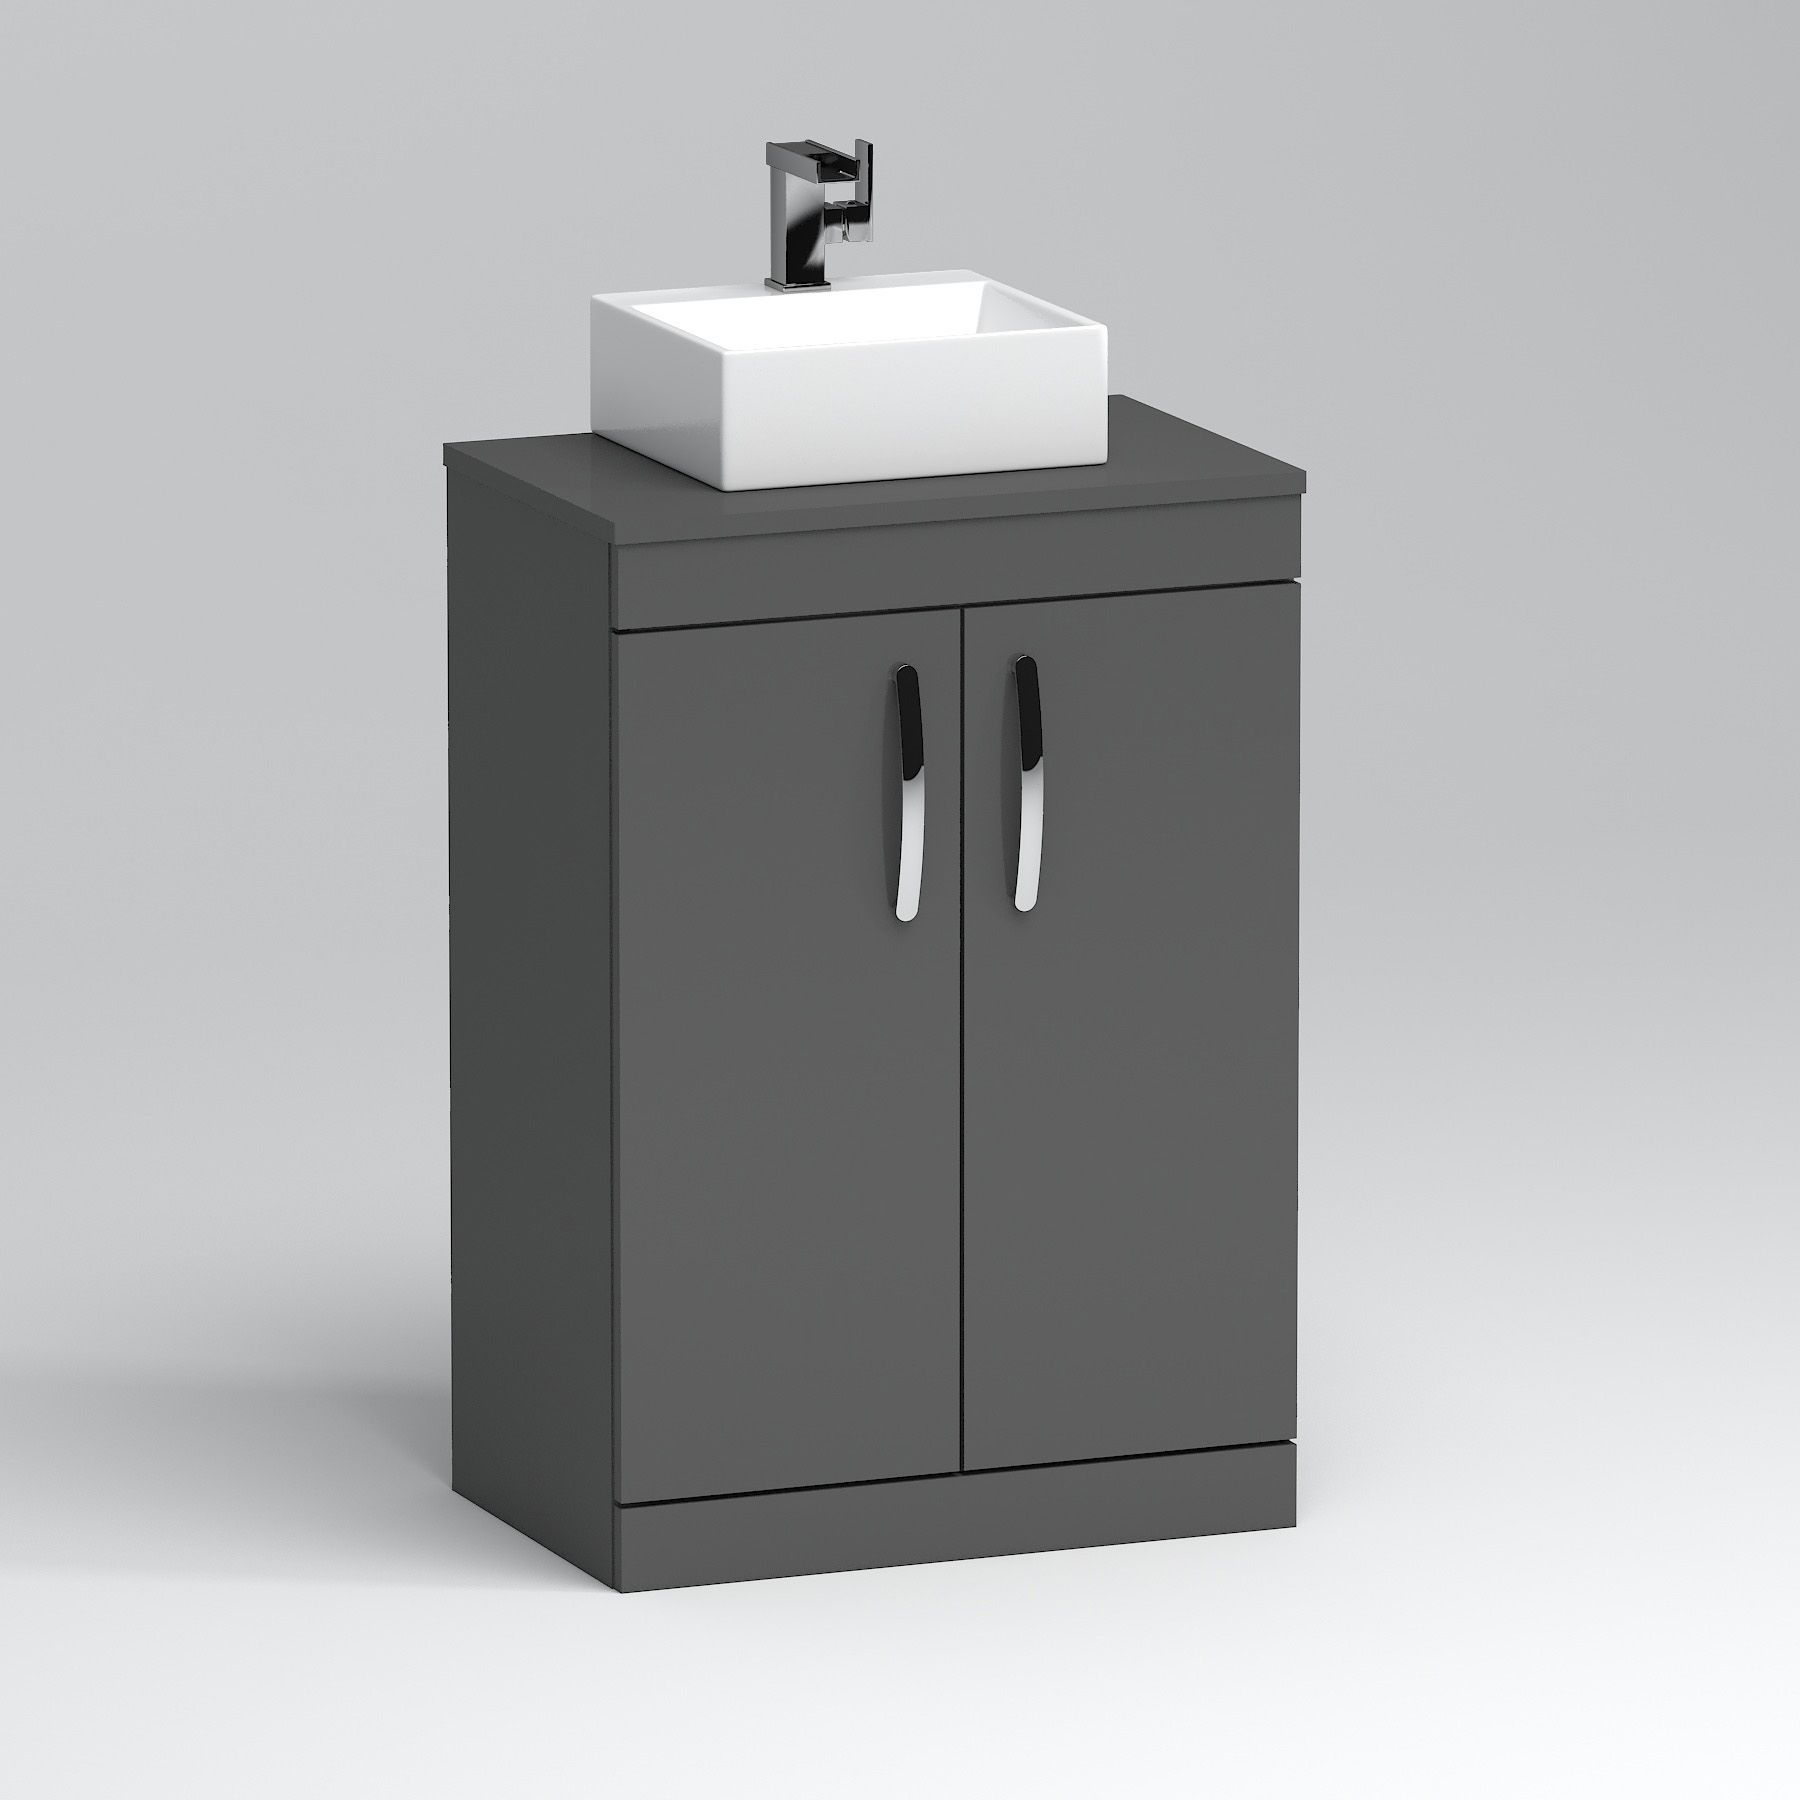 600mm Floor Standing Vanity Unit 2 Door Indigo Grey Gloss Countertop Basin Aqua 600mm Aqua Basin Counter In 2020 Vanity Units Countertop Basin Basin Vanity Unit